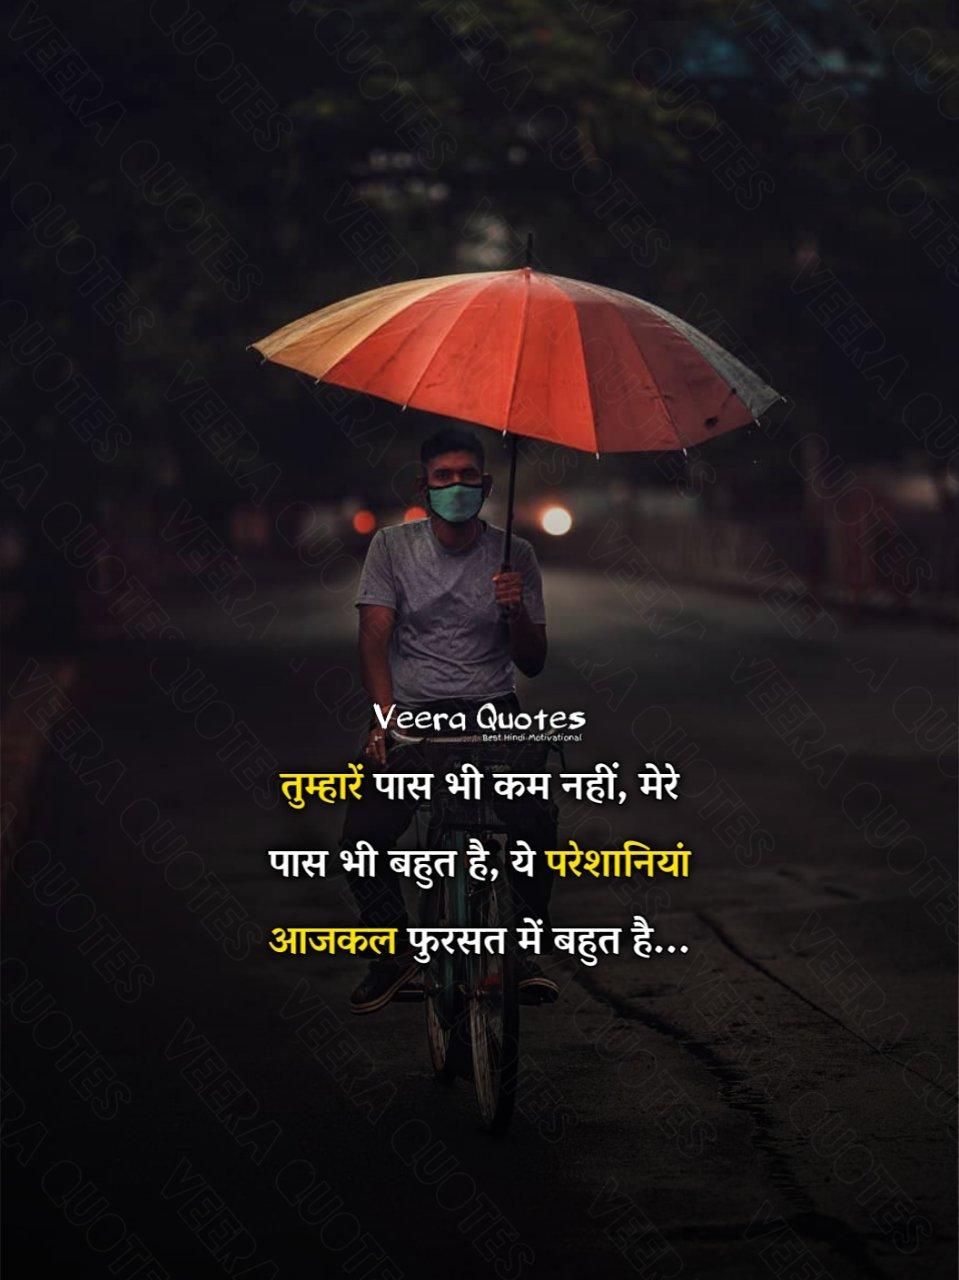 Veera Best Hindi Motivational Quotes on Twitter ...